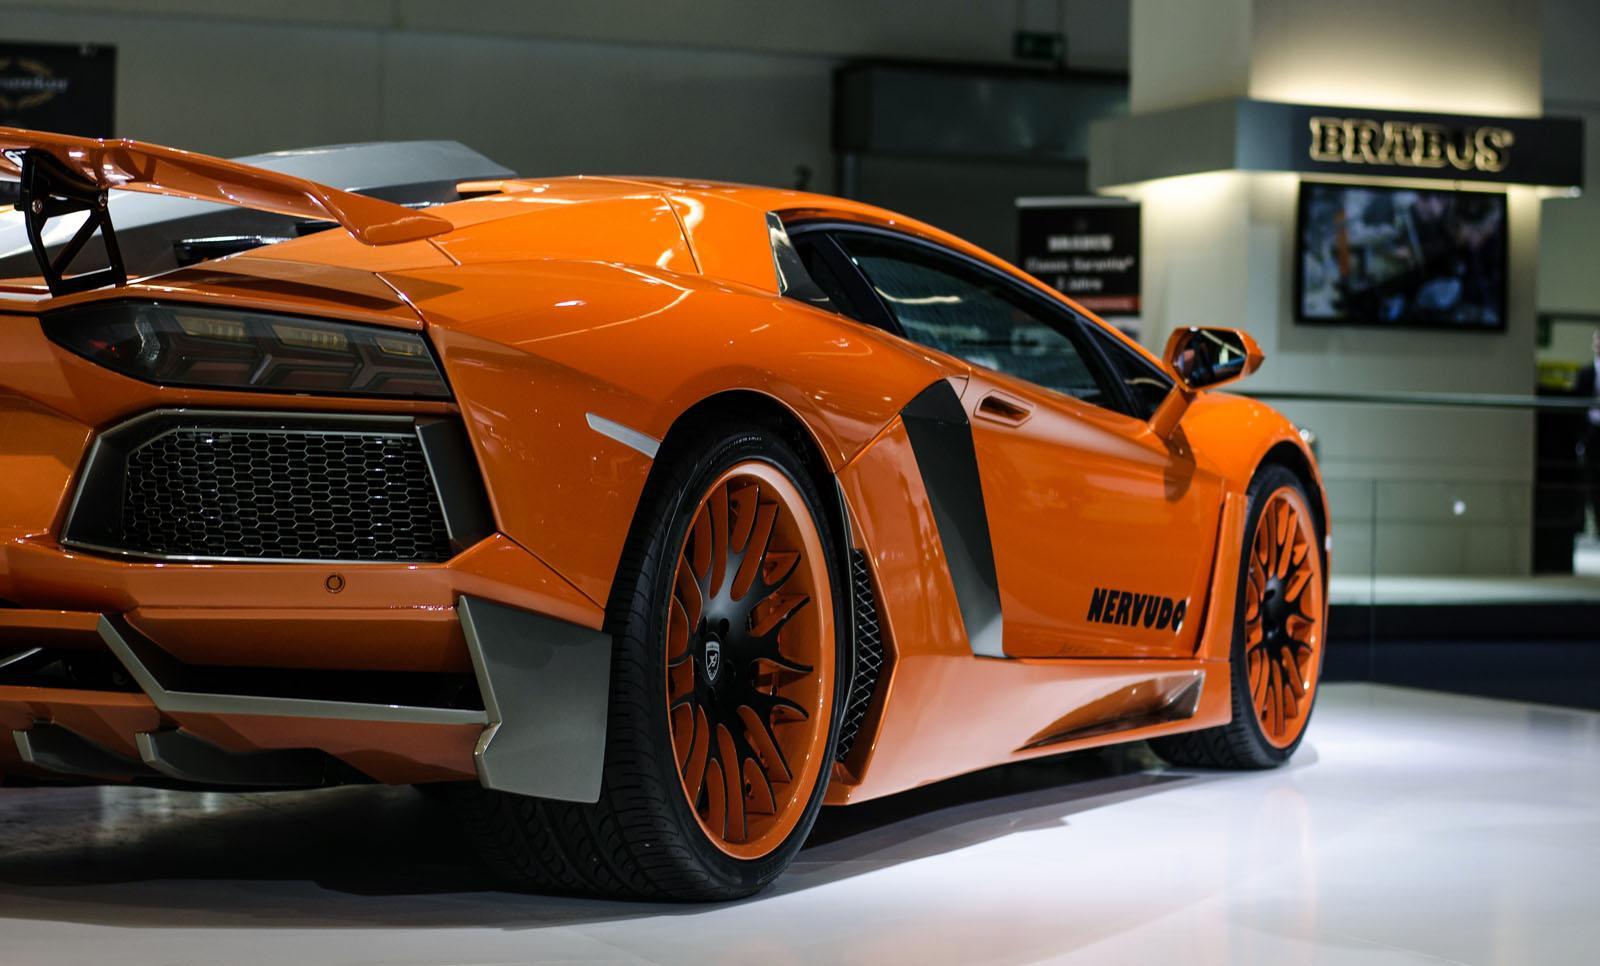 Lamborghini Cars News Hamann Tuned Aventador Nervudo